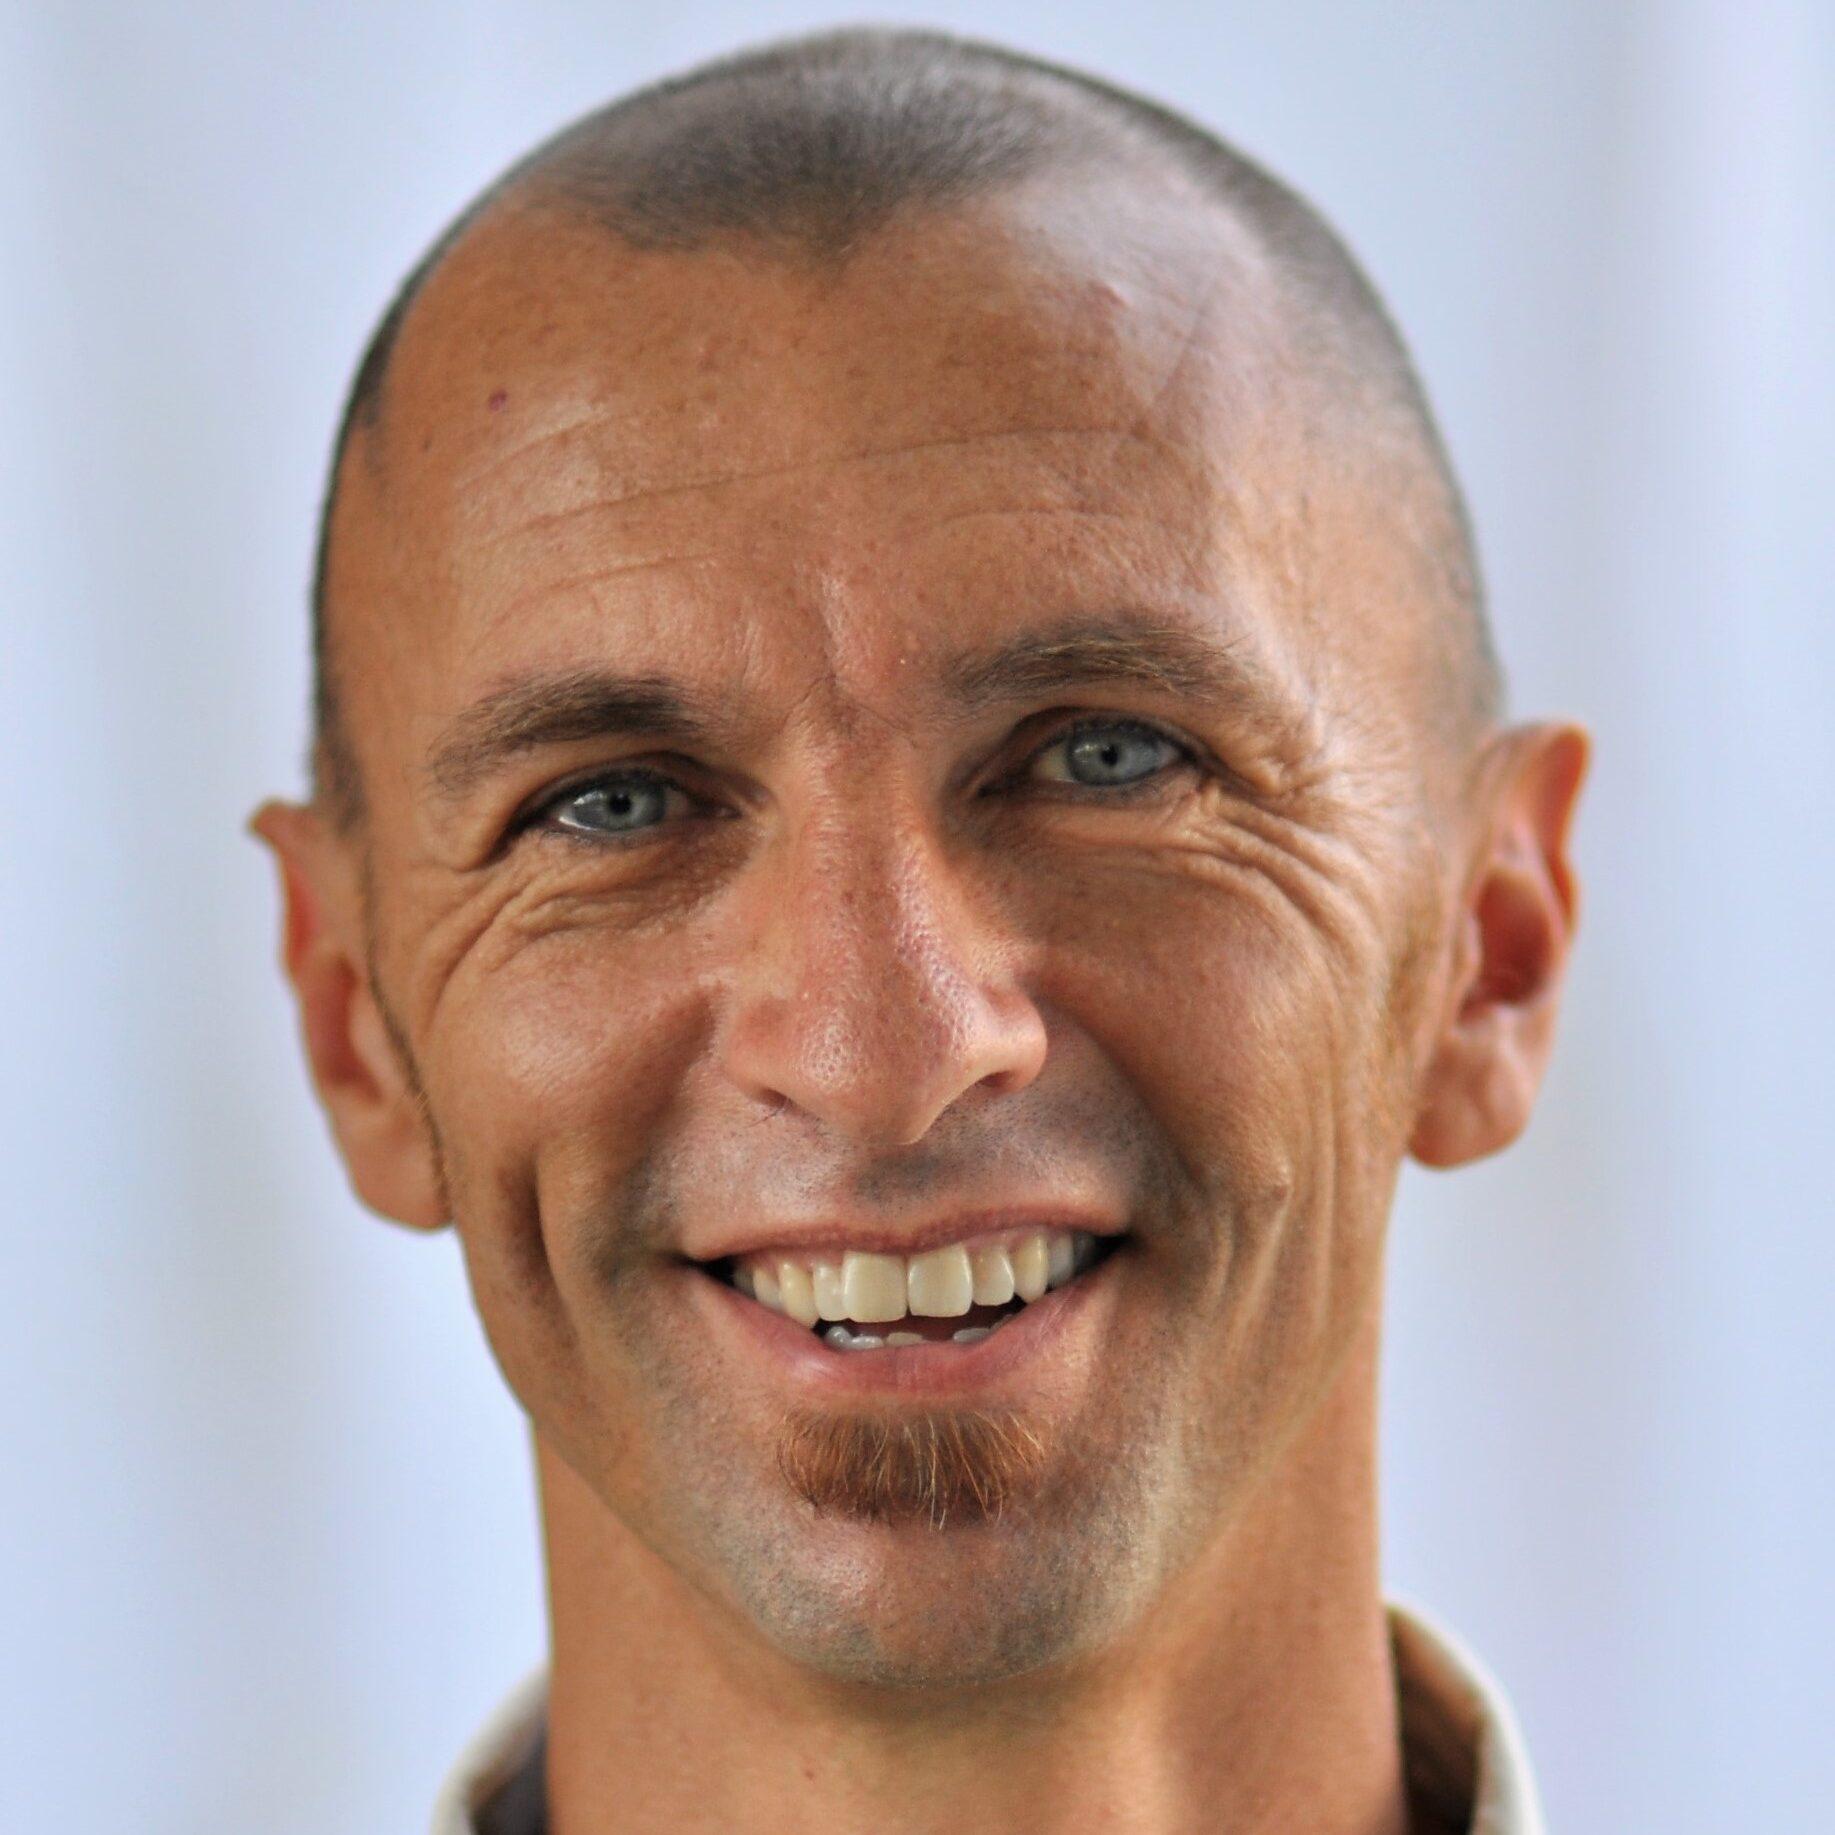 Marco Citterio